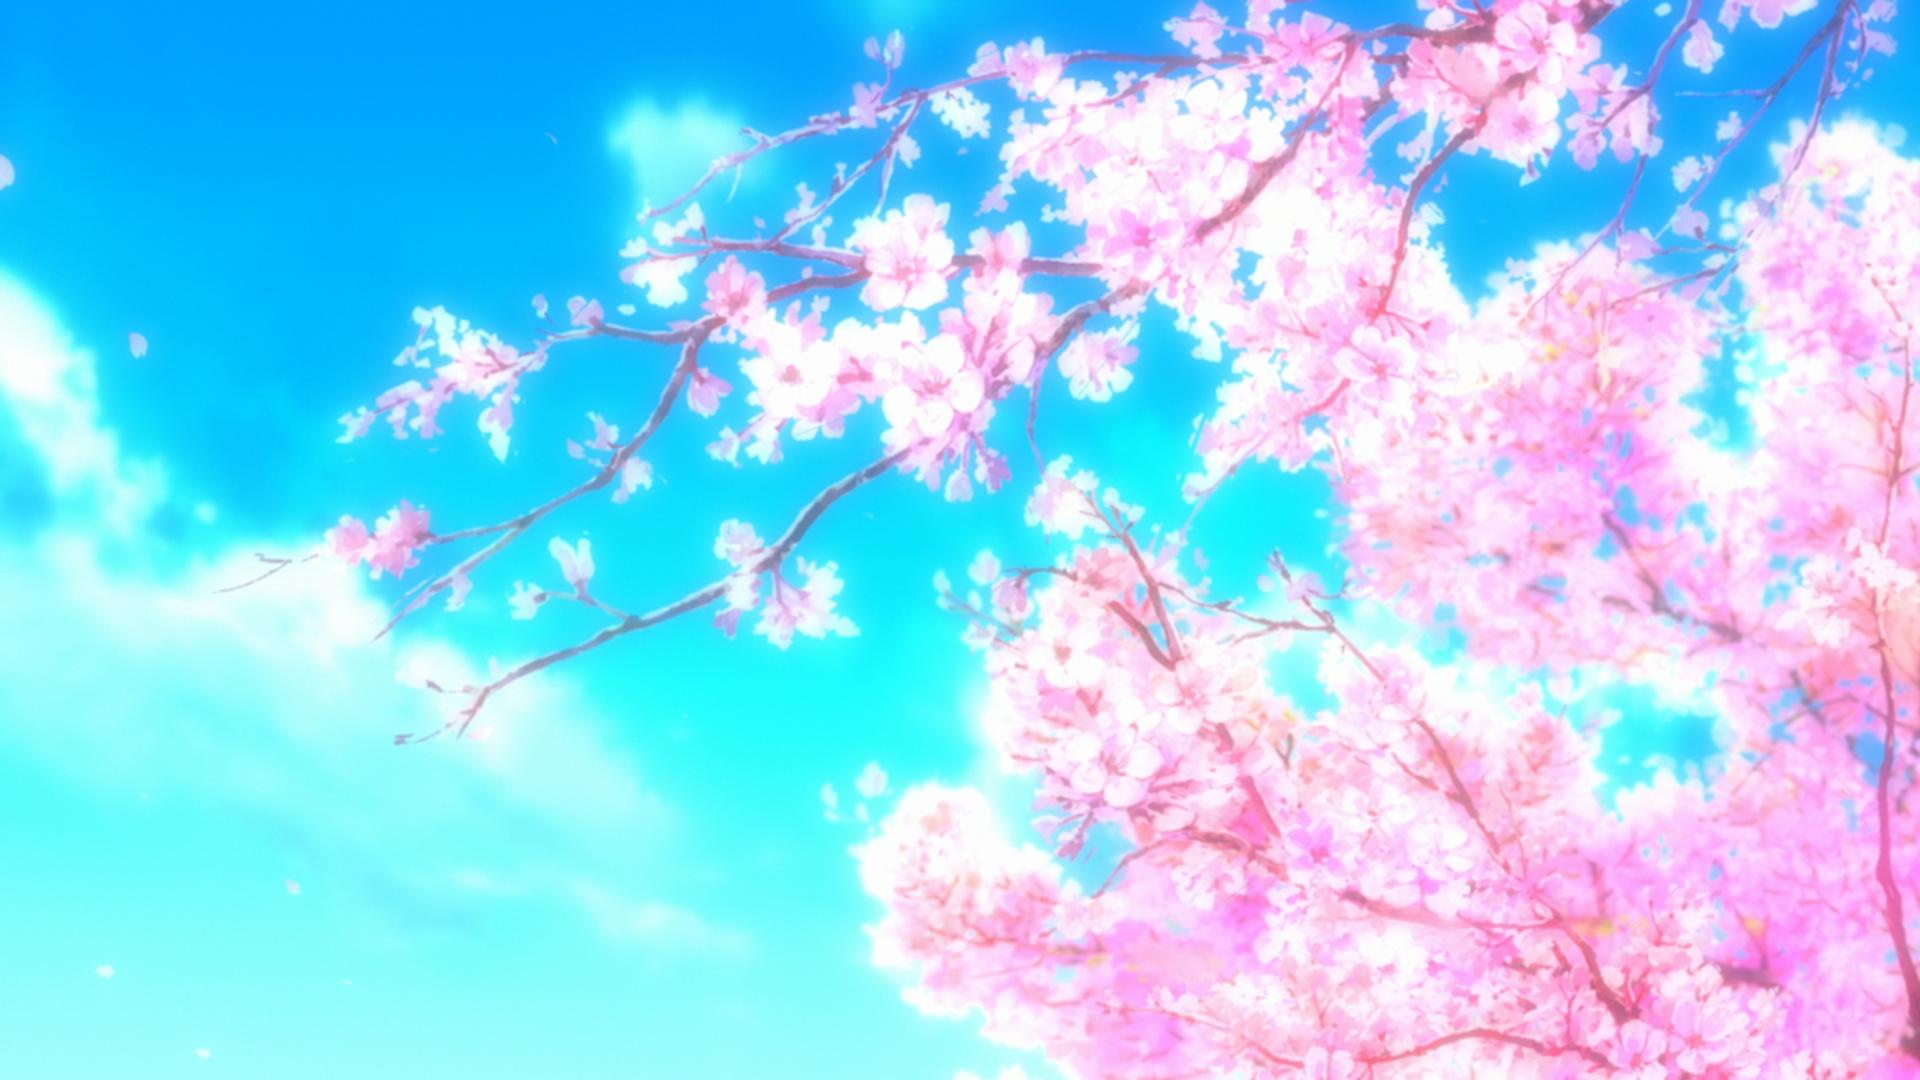 More Discrete Anime Wallpapers Post Anime Cherry Blossom Cherry Blossom Wallpaper Anime Backgrounds Wallpapers